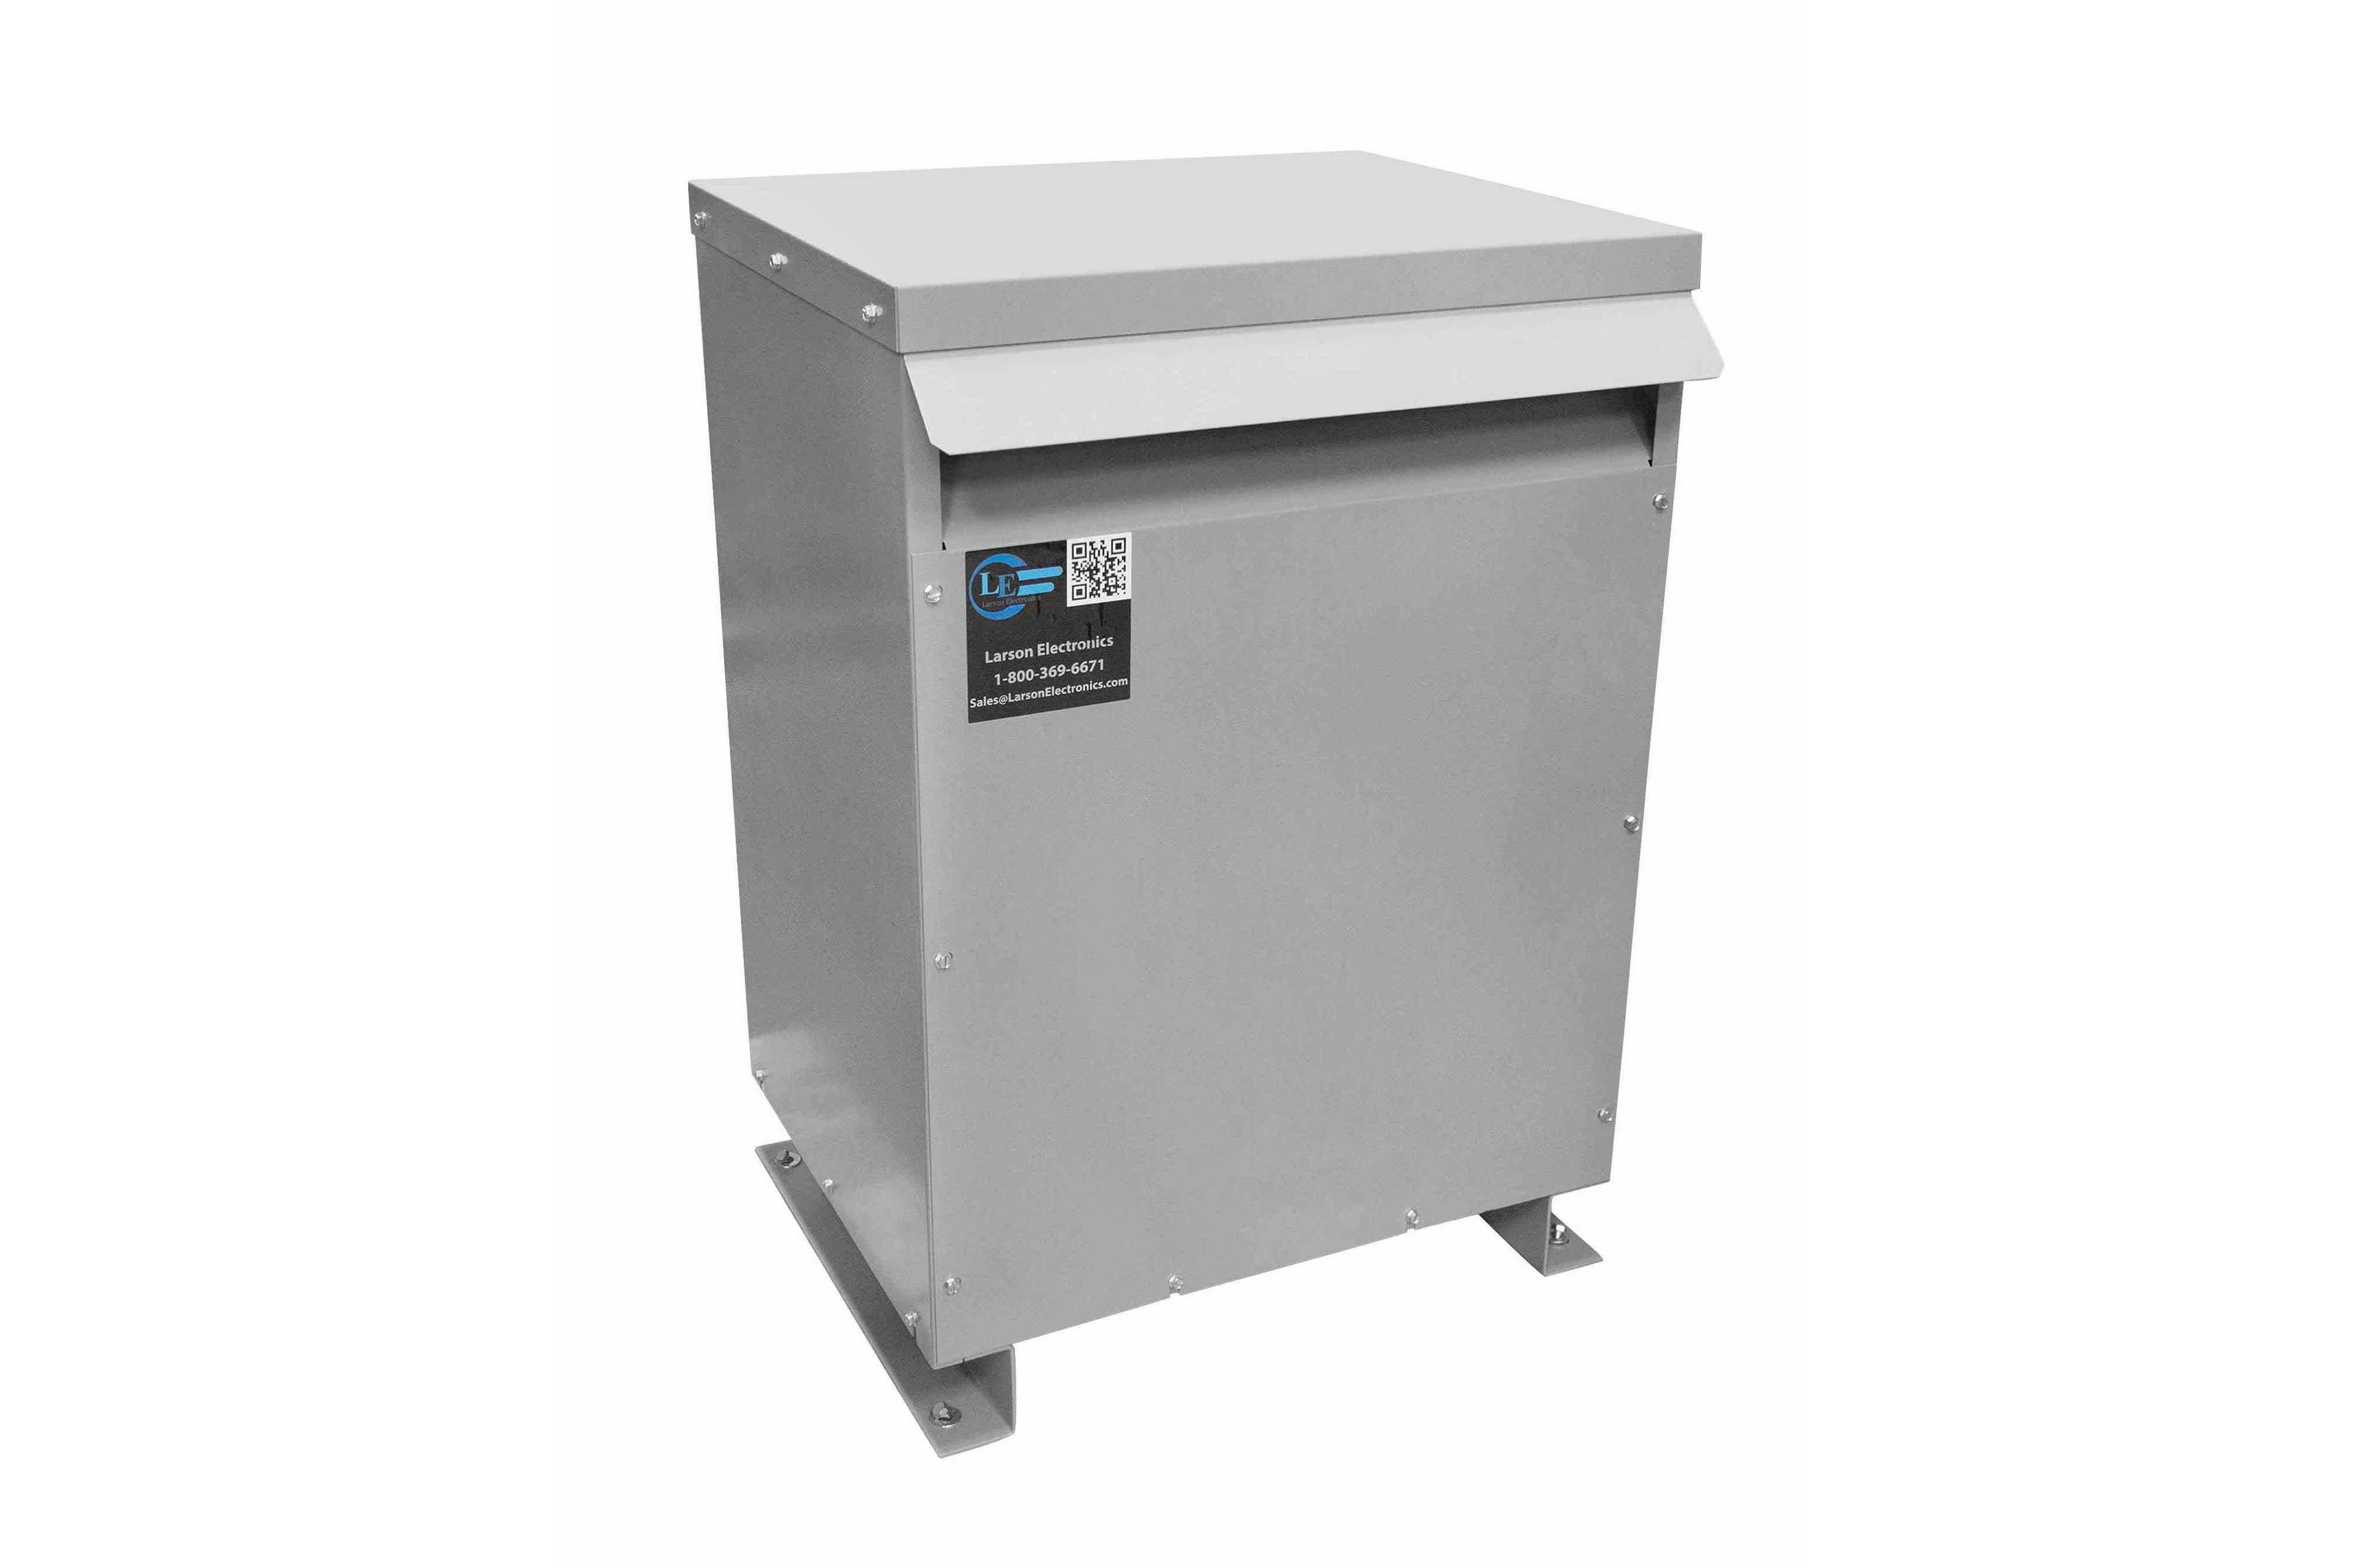 52.5 kVA 3PH Isolation Transformer, 575V Wye Primary, 208V Delta Secondary, N3R, Ventilated, 60 Hz